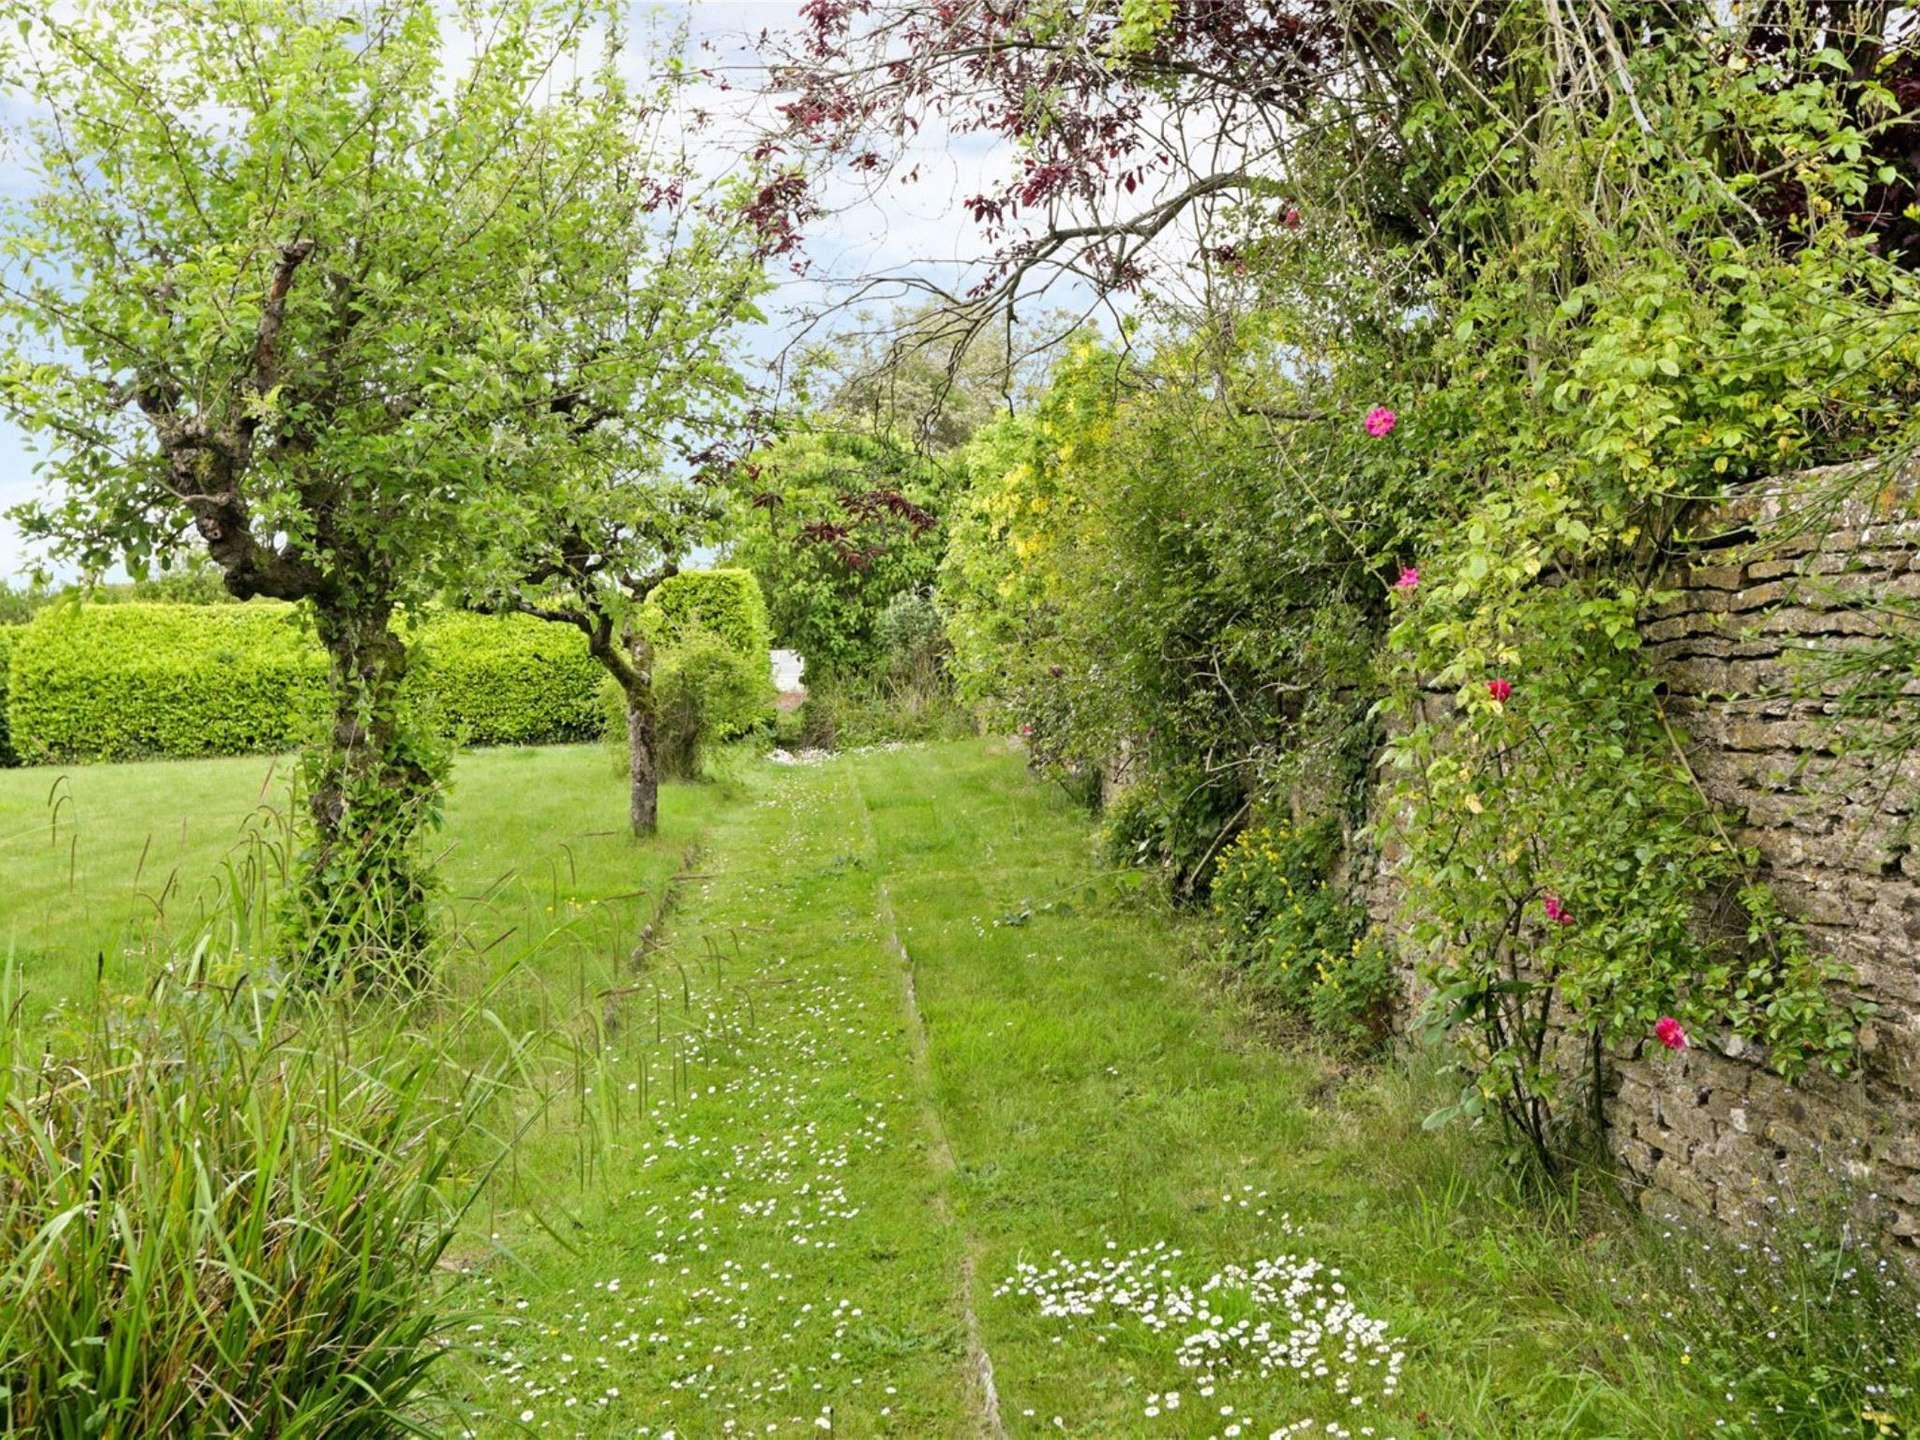 Savills - Park Grove, Stalbridge, Sturminster Newton, Dorset, Dt10 2Ra